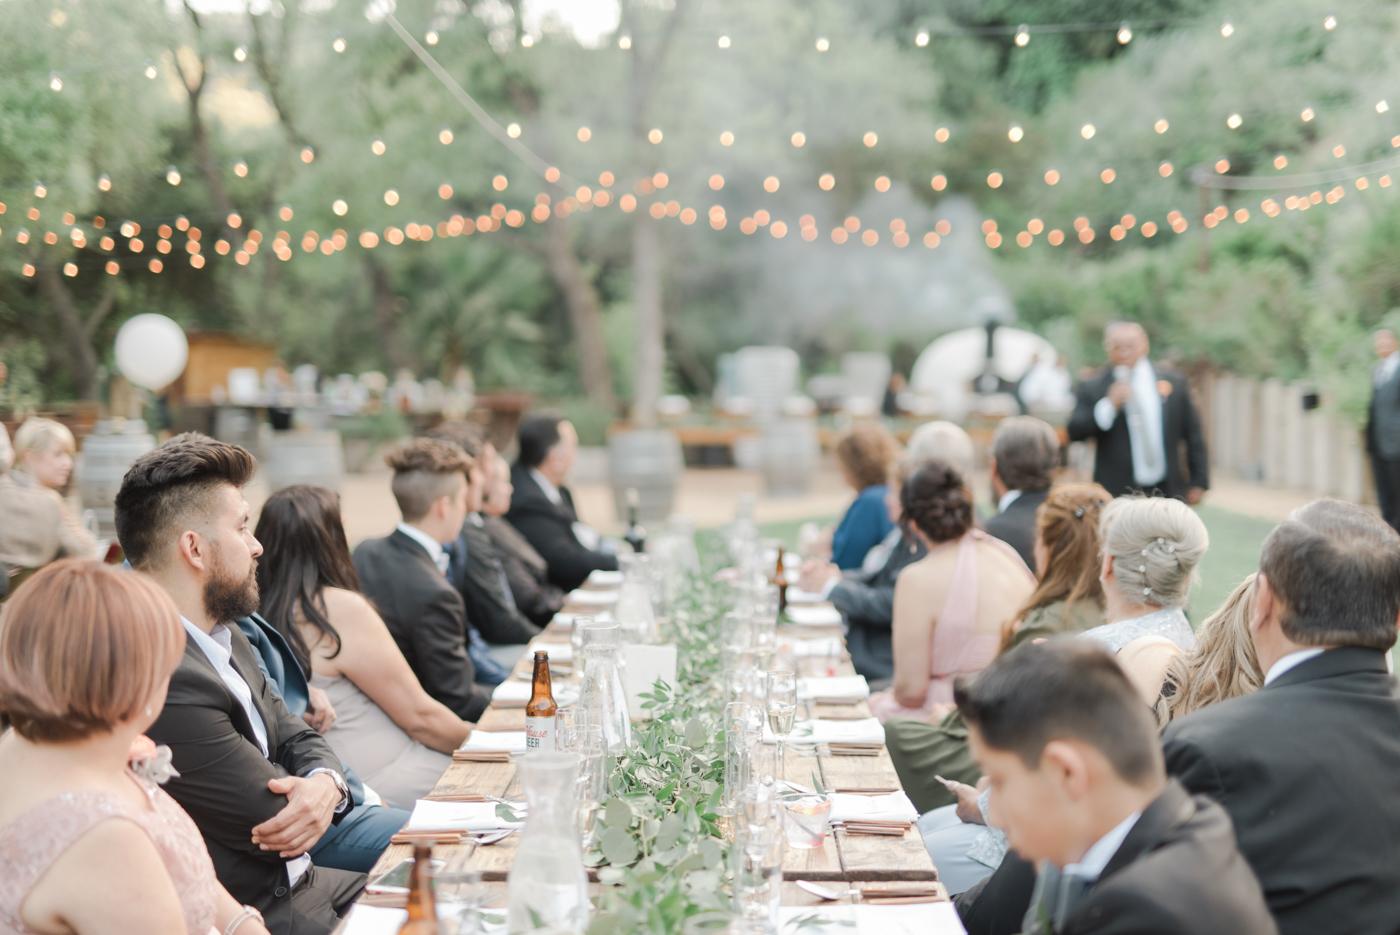 l&c-the_1909_spring_garden_wedding_los_angeles_fine_art_wedding_photographer-37.jpg